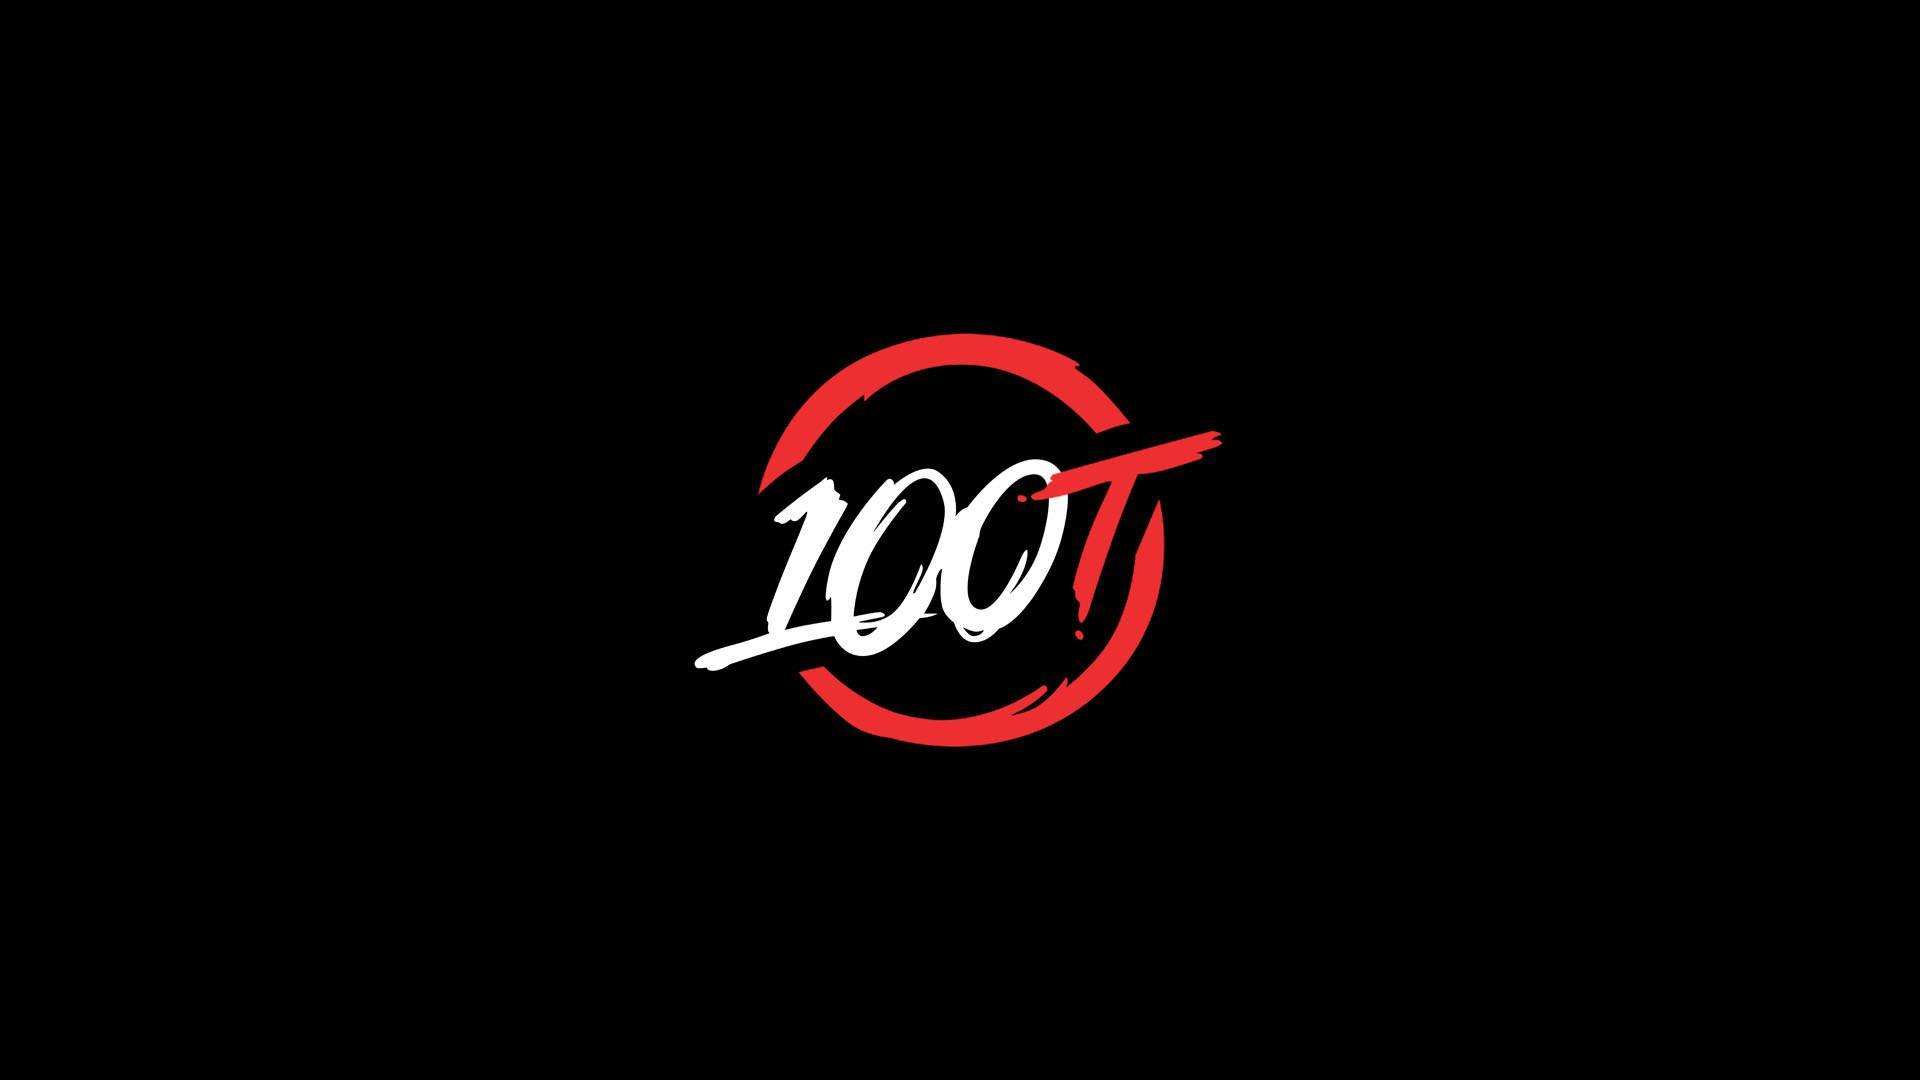 100t 1920x1080 Wallpaper Wallpaper Thies Best Games